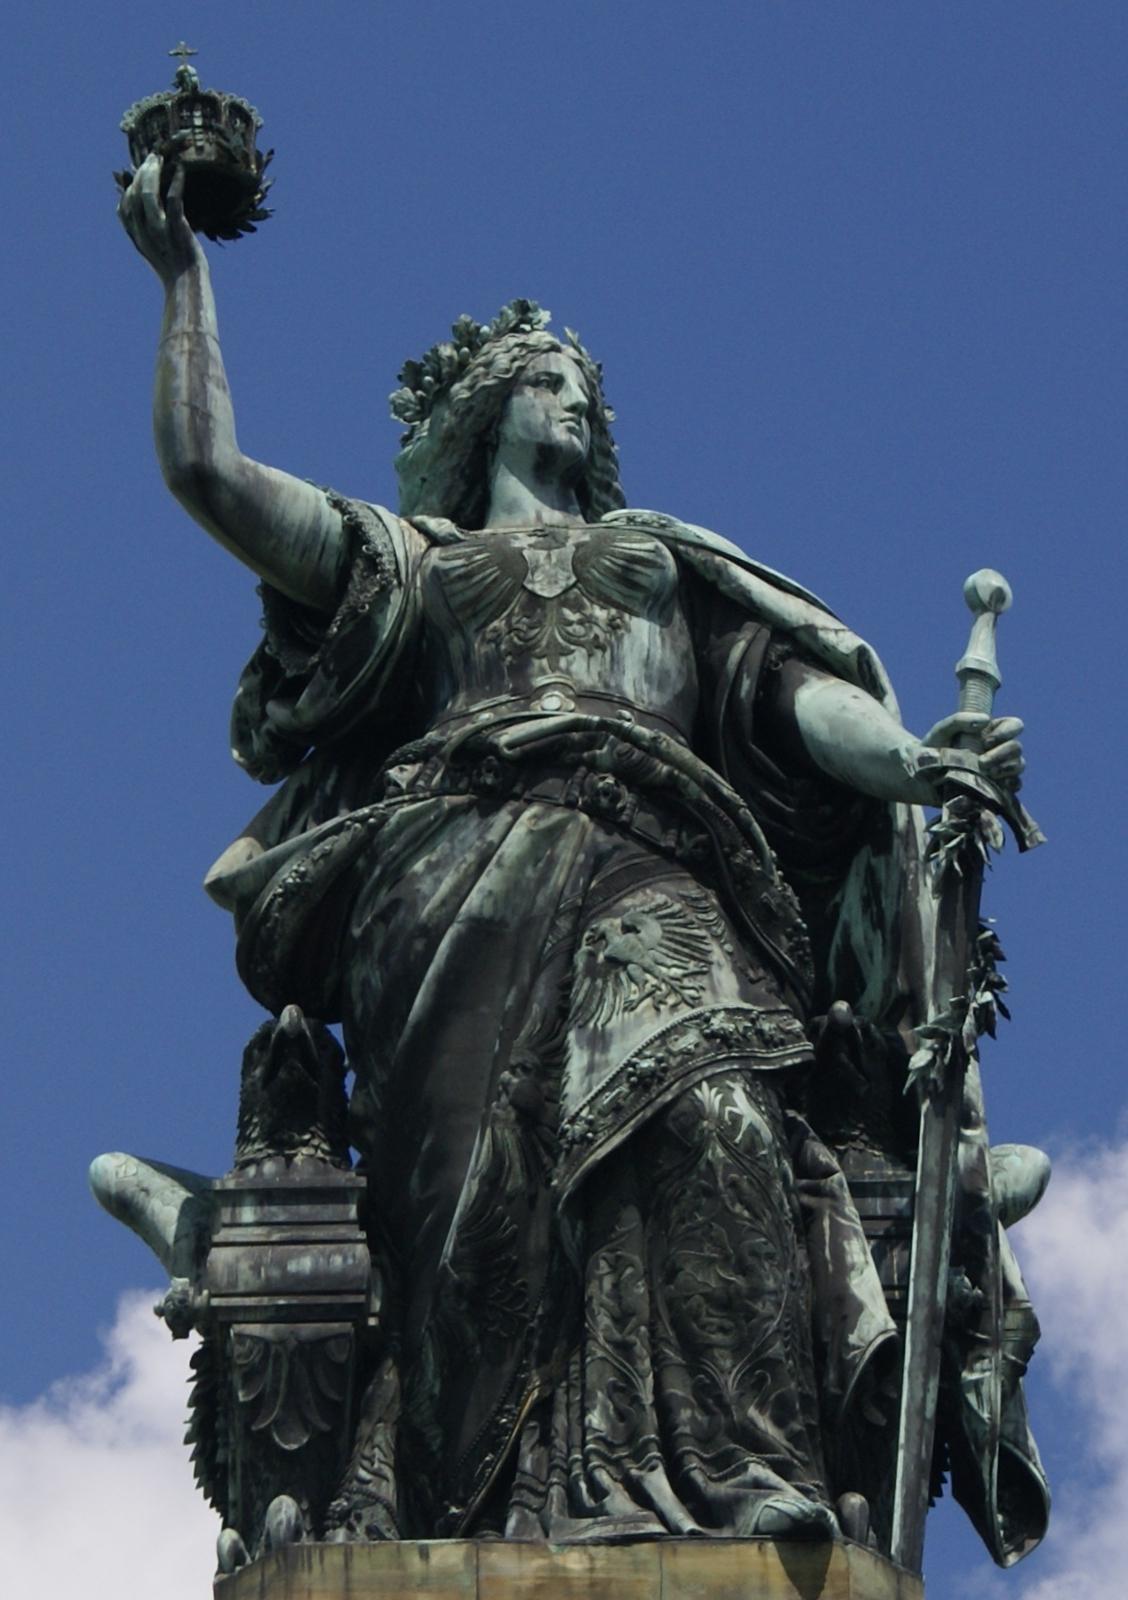 https://upload.wikimedia.org/wikipedia/commons/e/e3/Germania_figur.jpg